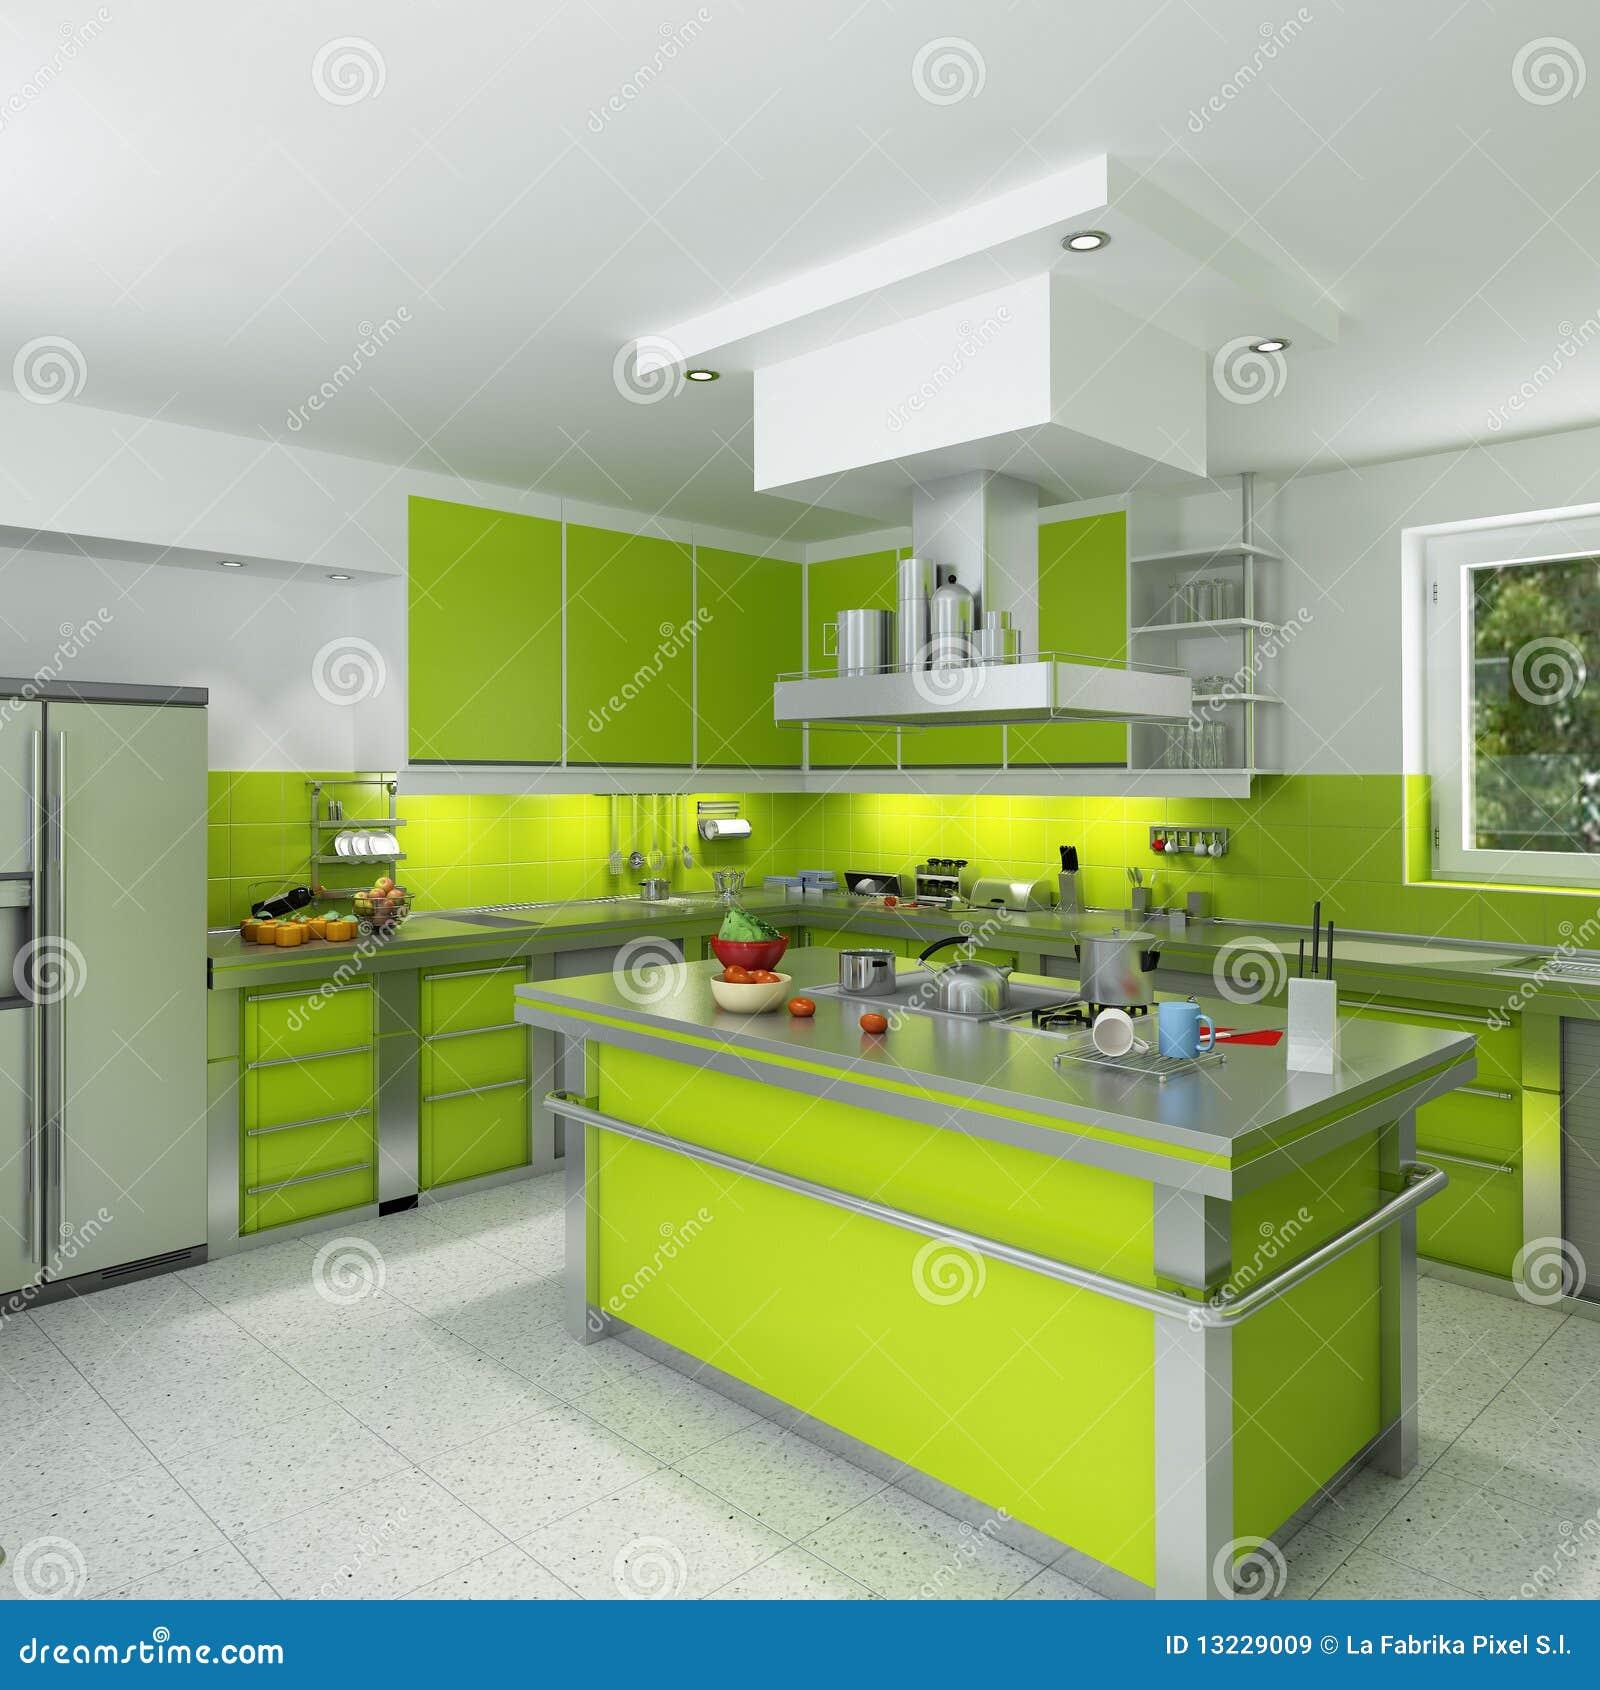 Cocina verde moderna im genes de archivo libres de for Cocinas verdes modernas